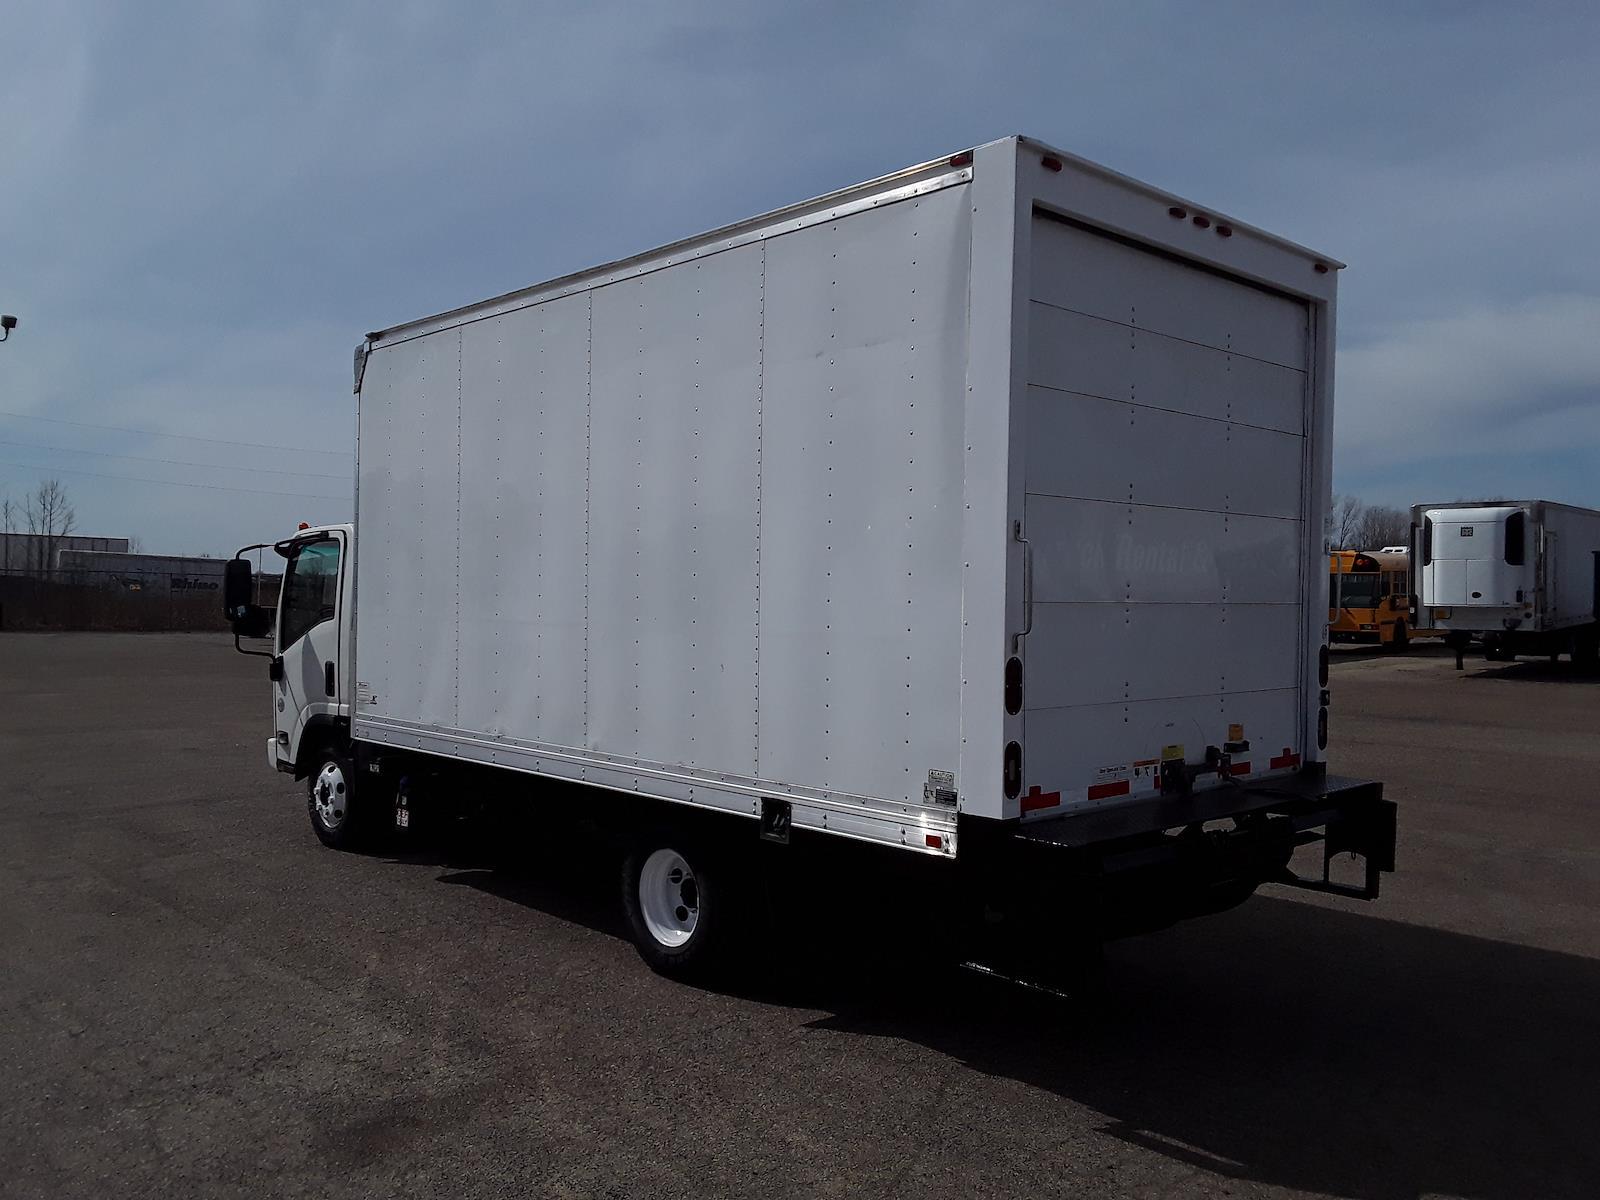 2015 Isuzu NPR-HD Regular Cab 4x2, Dry Freight #646598 - photo 1